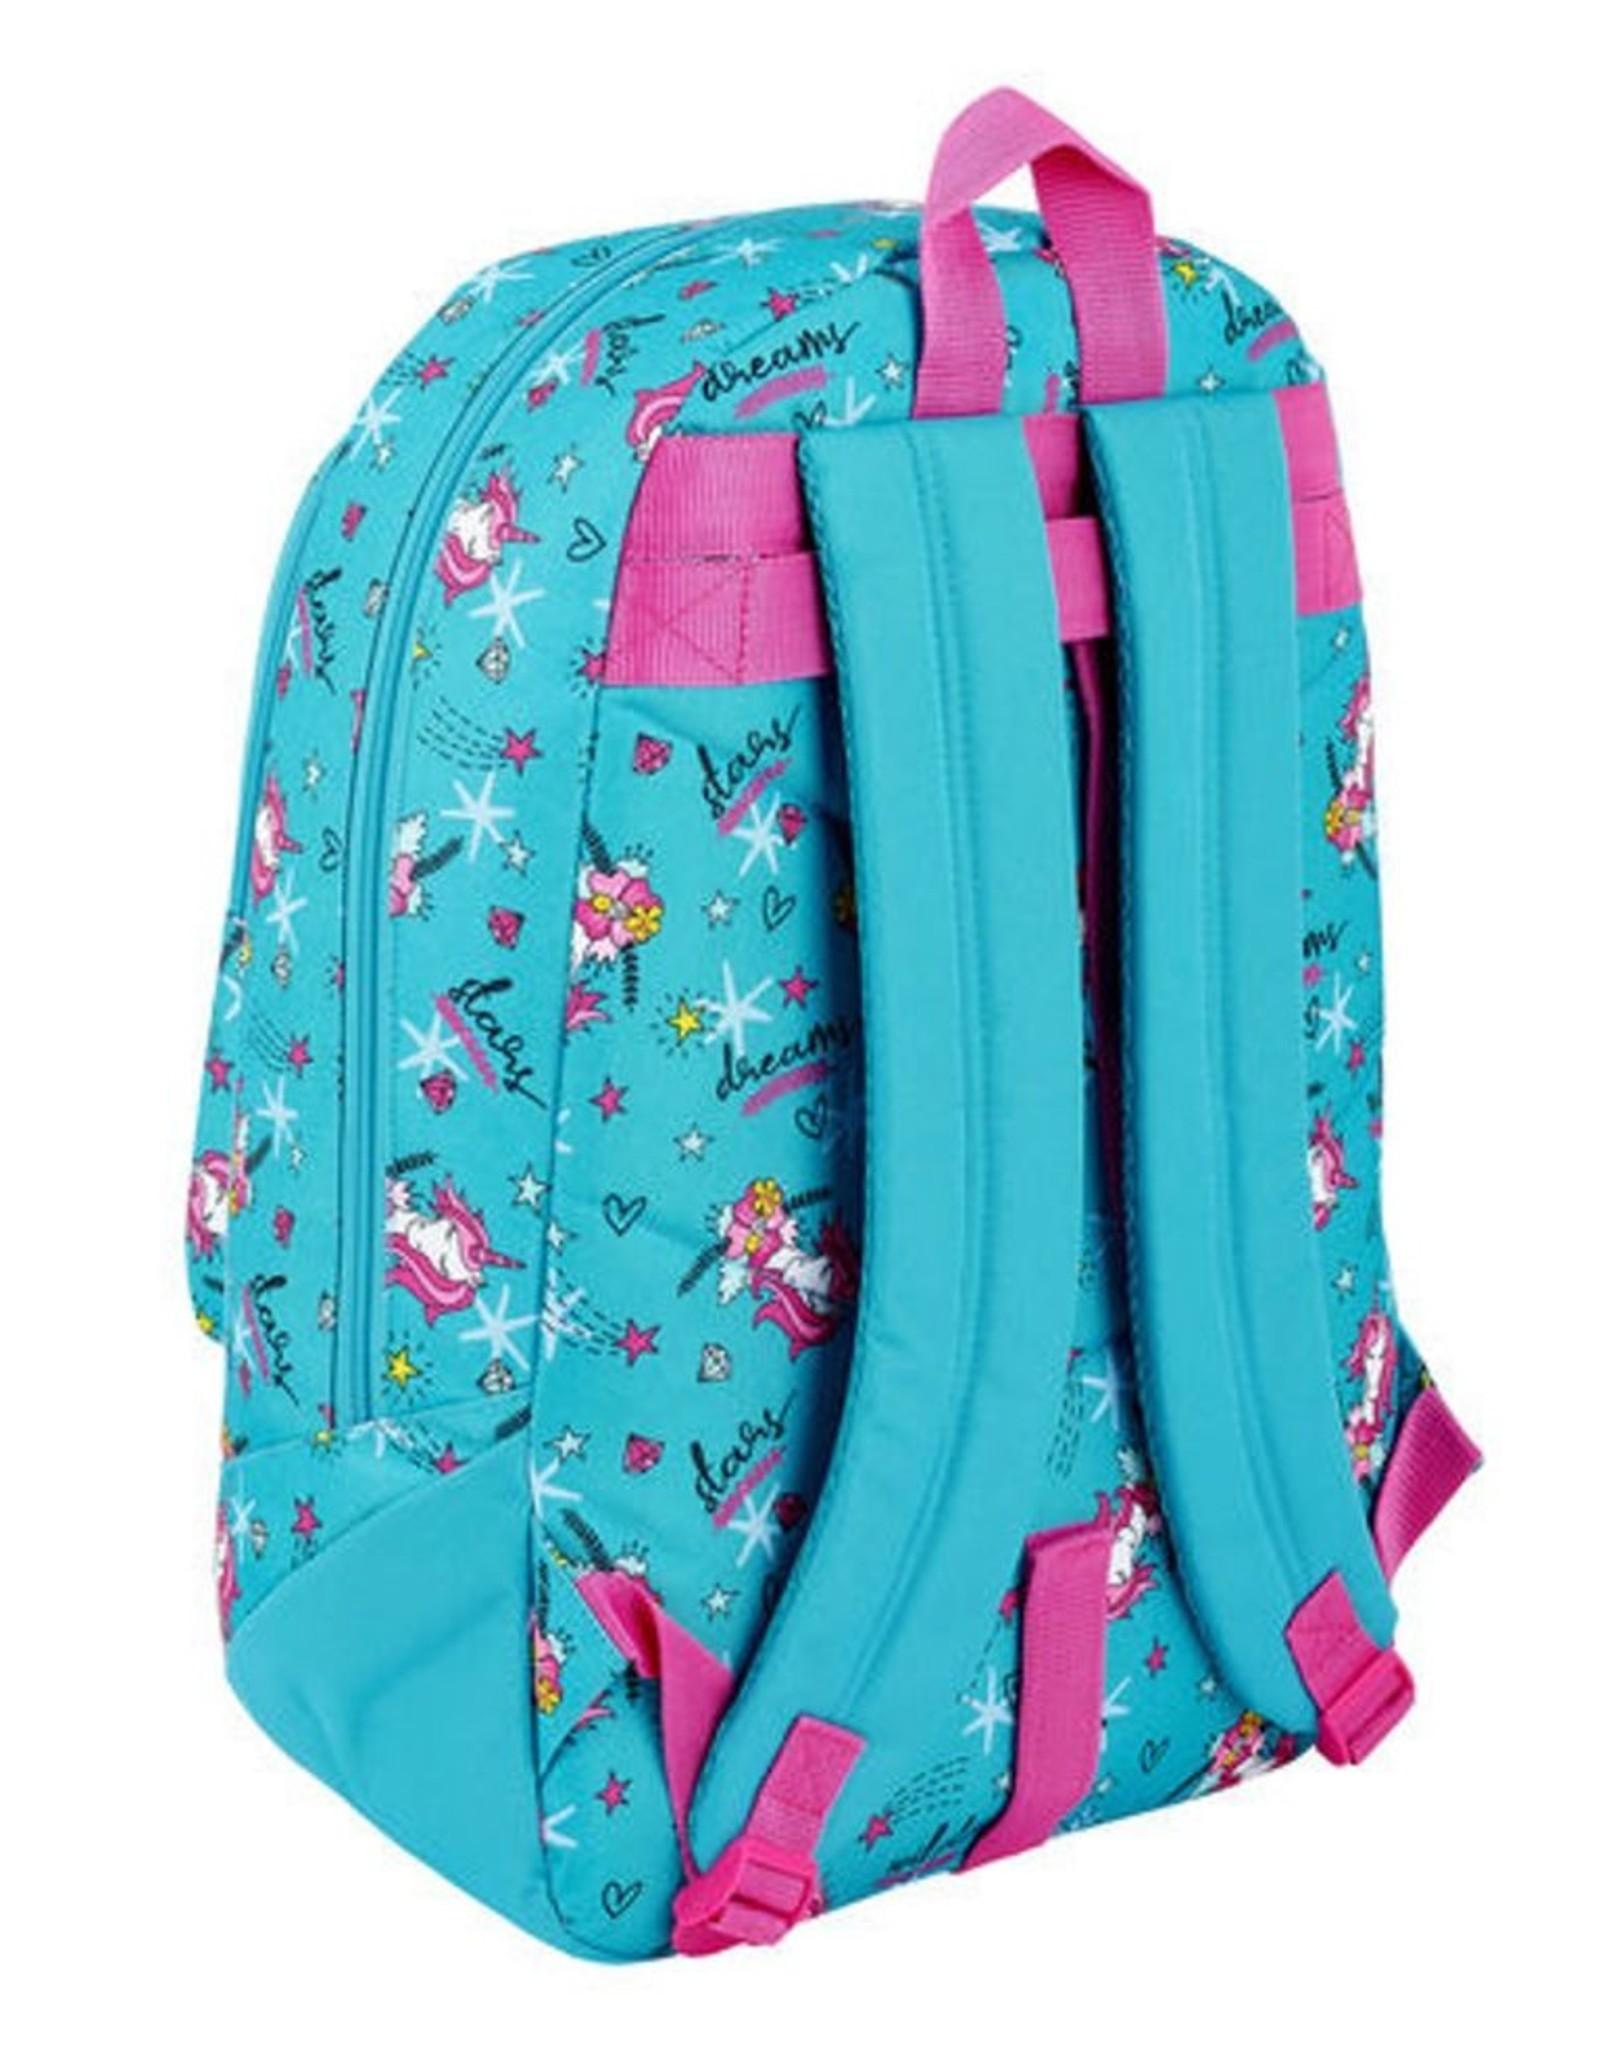 Safta Fantasy bags - Glowlab Fantasy Backpack Make a Wish